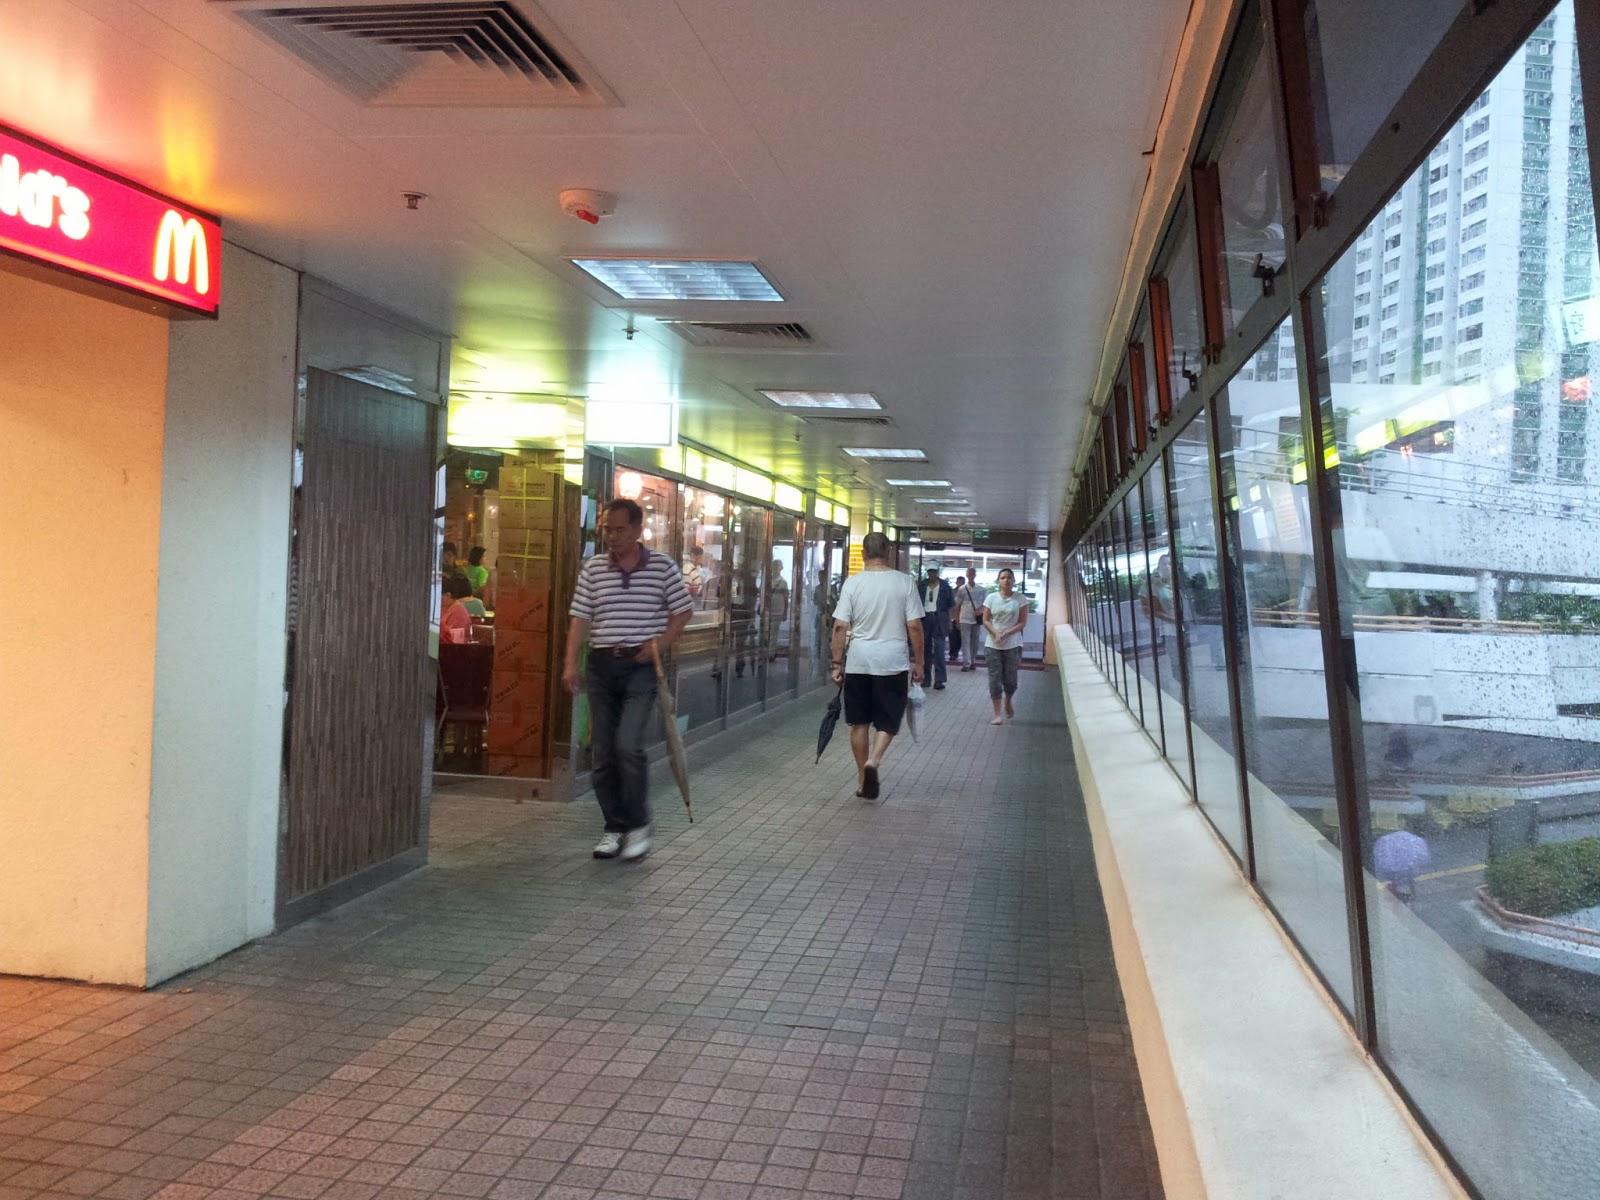 Grassroots O2: [領匯商場] 美林商場 @2014-07-26